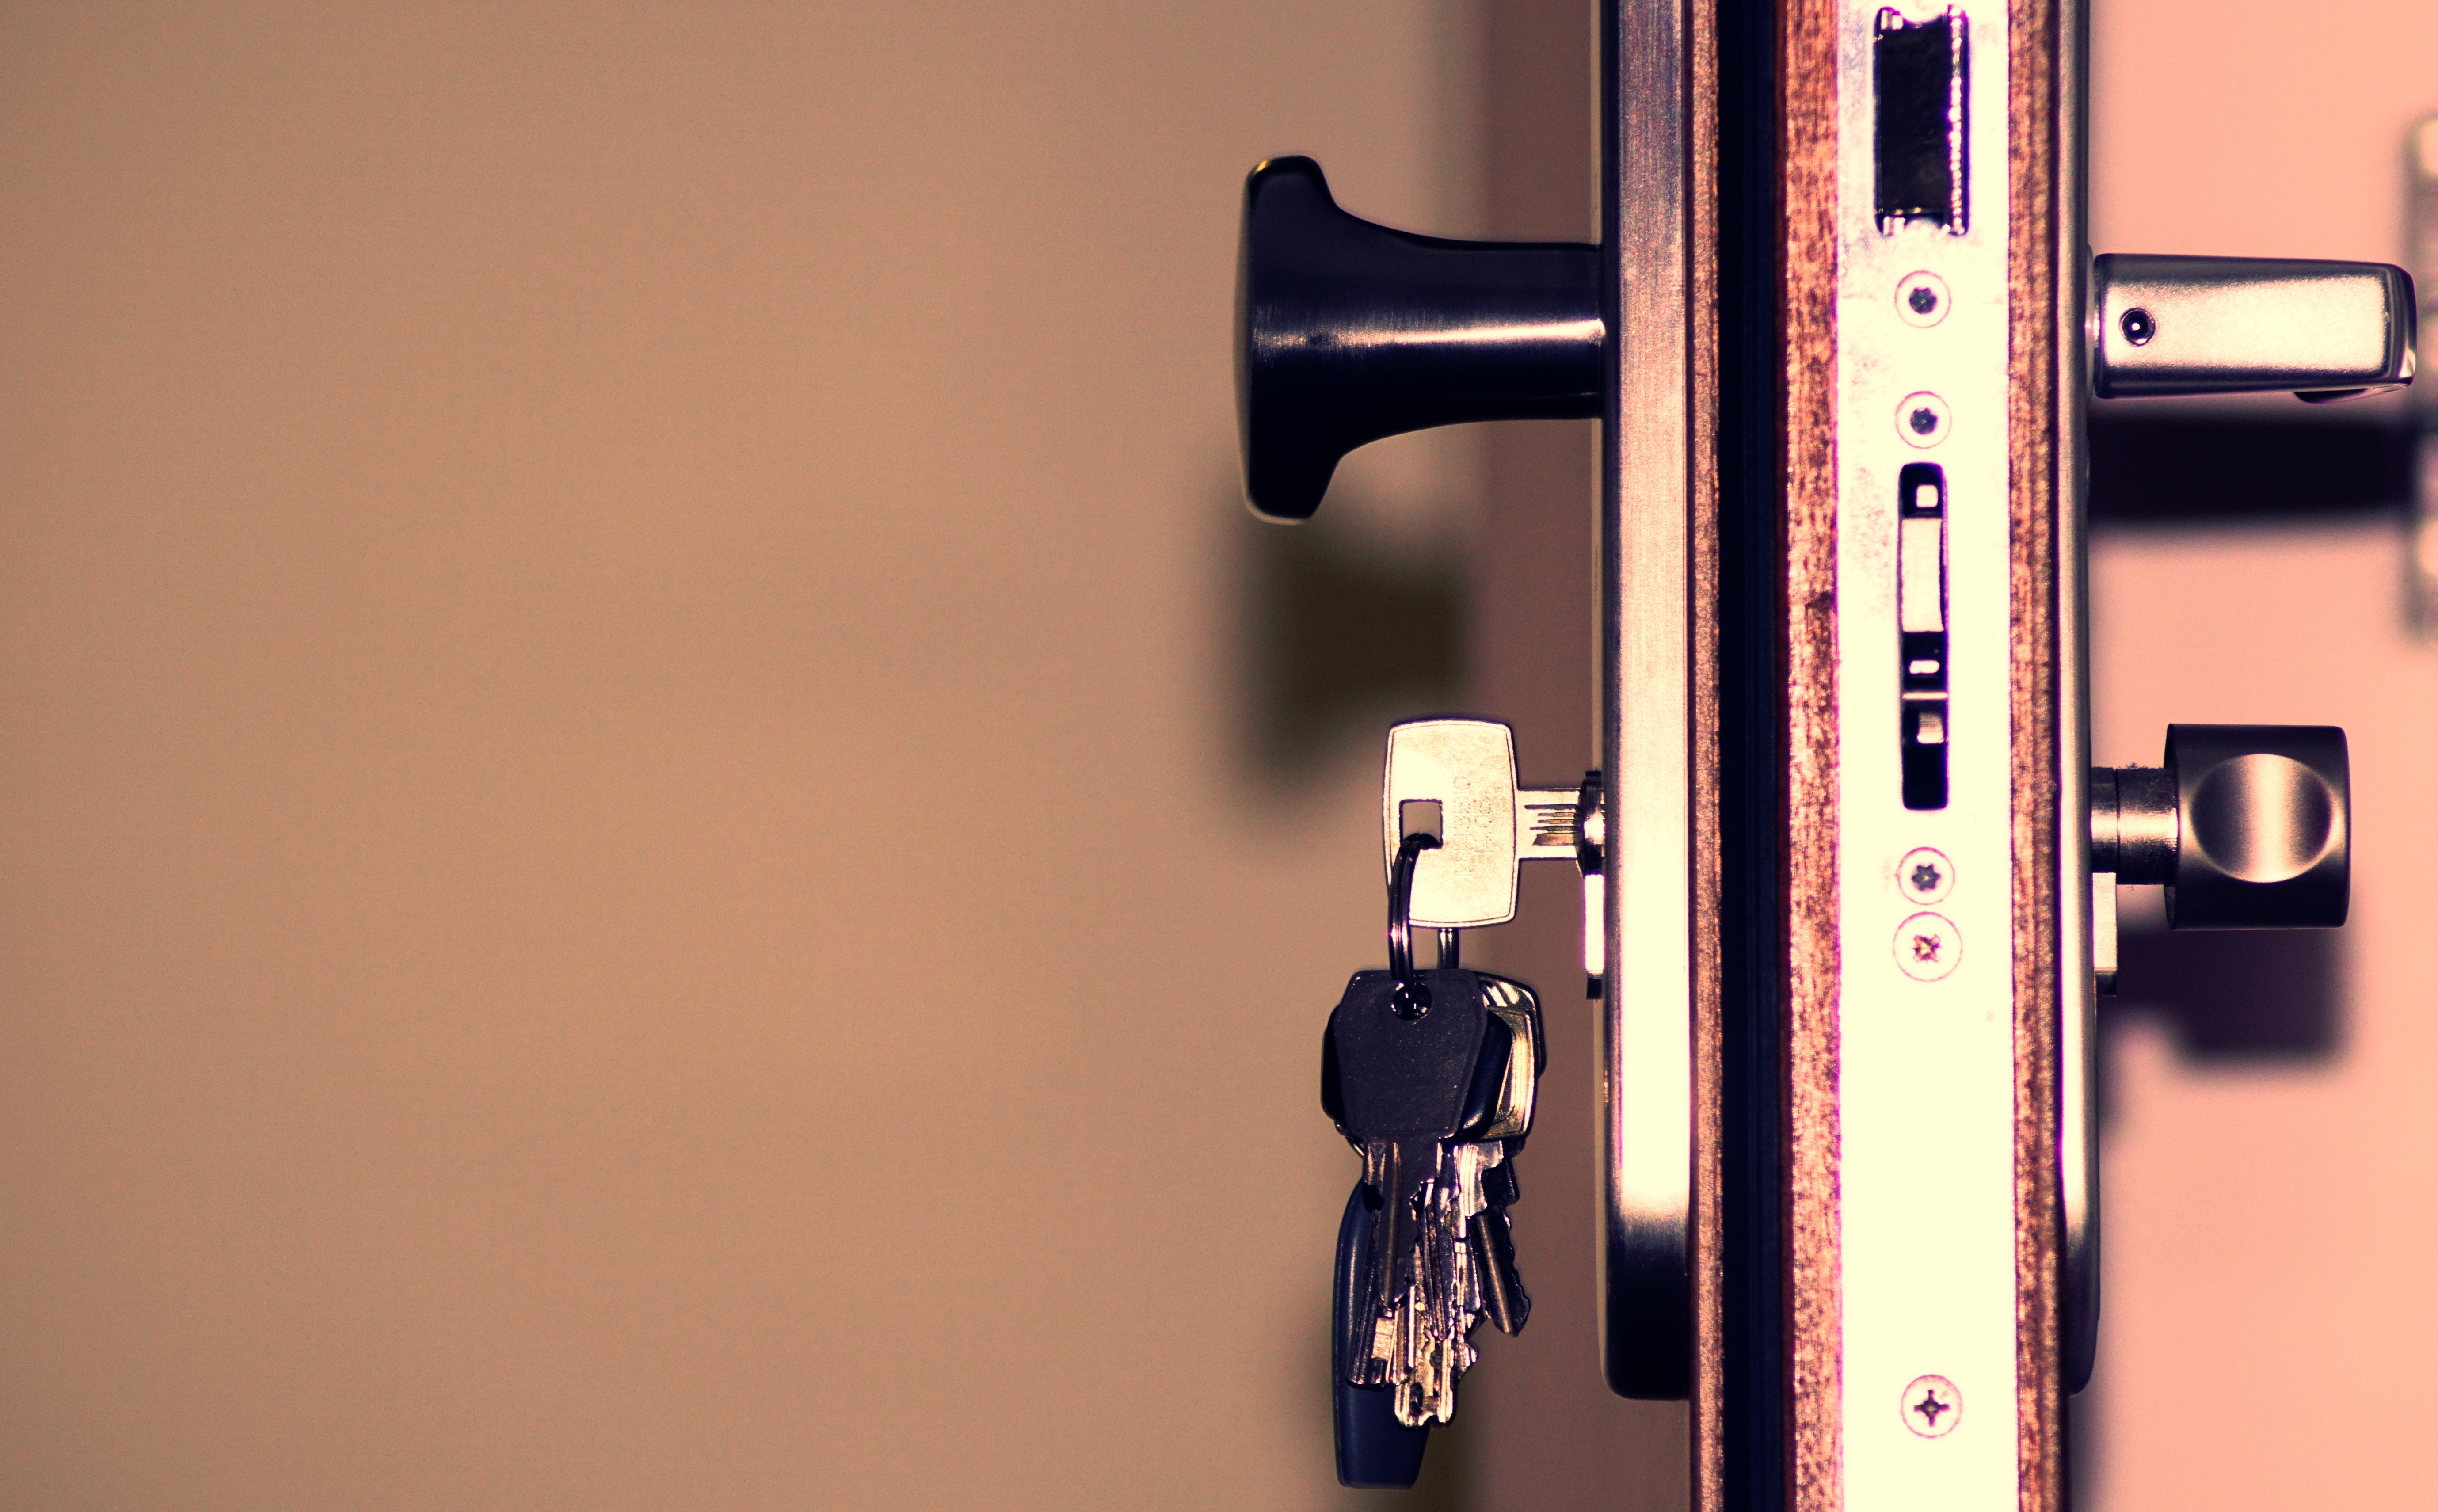 DIY Security System Versus Professional